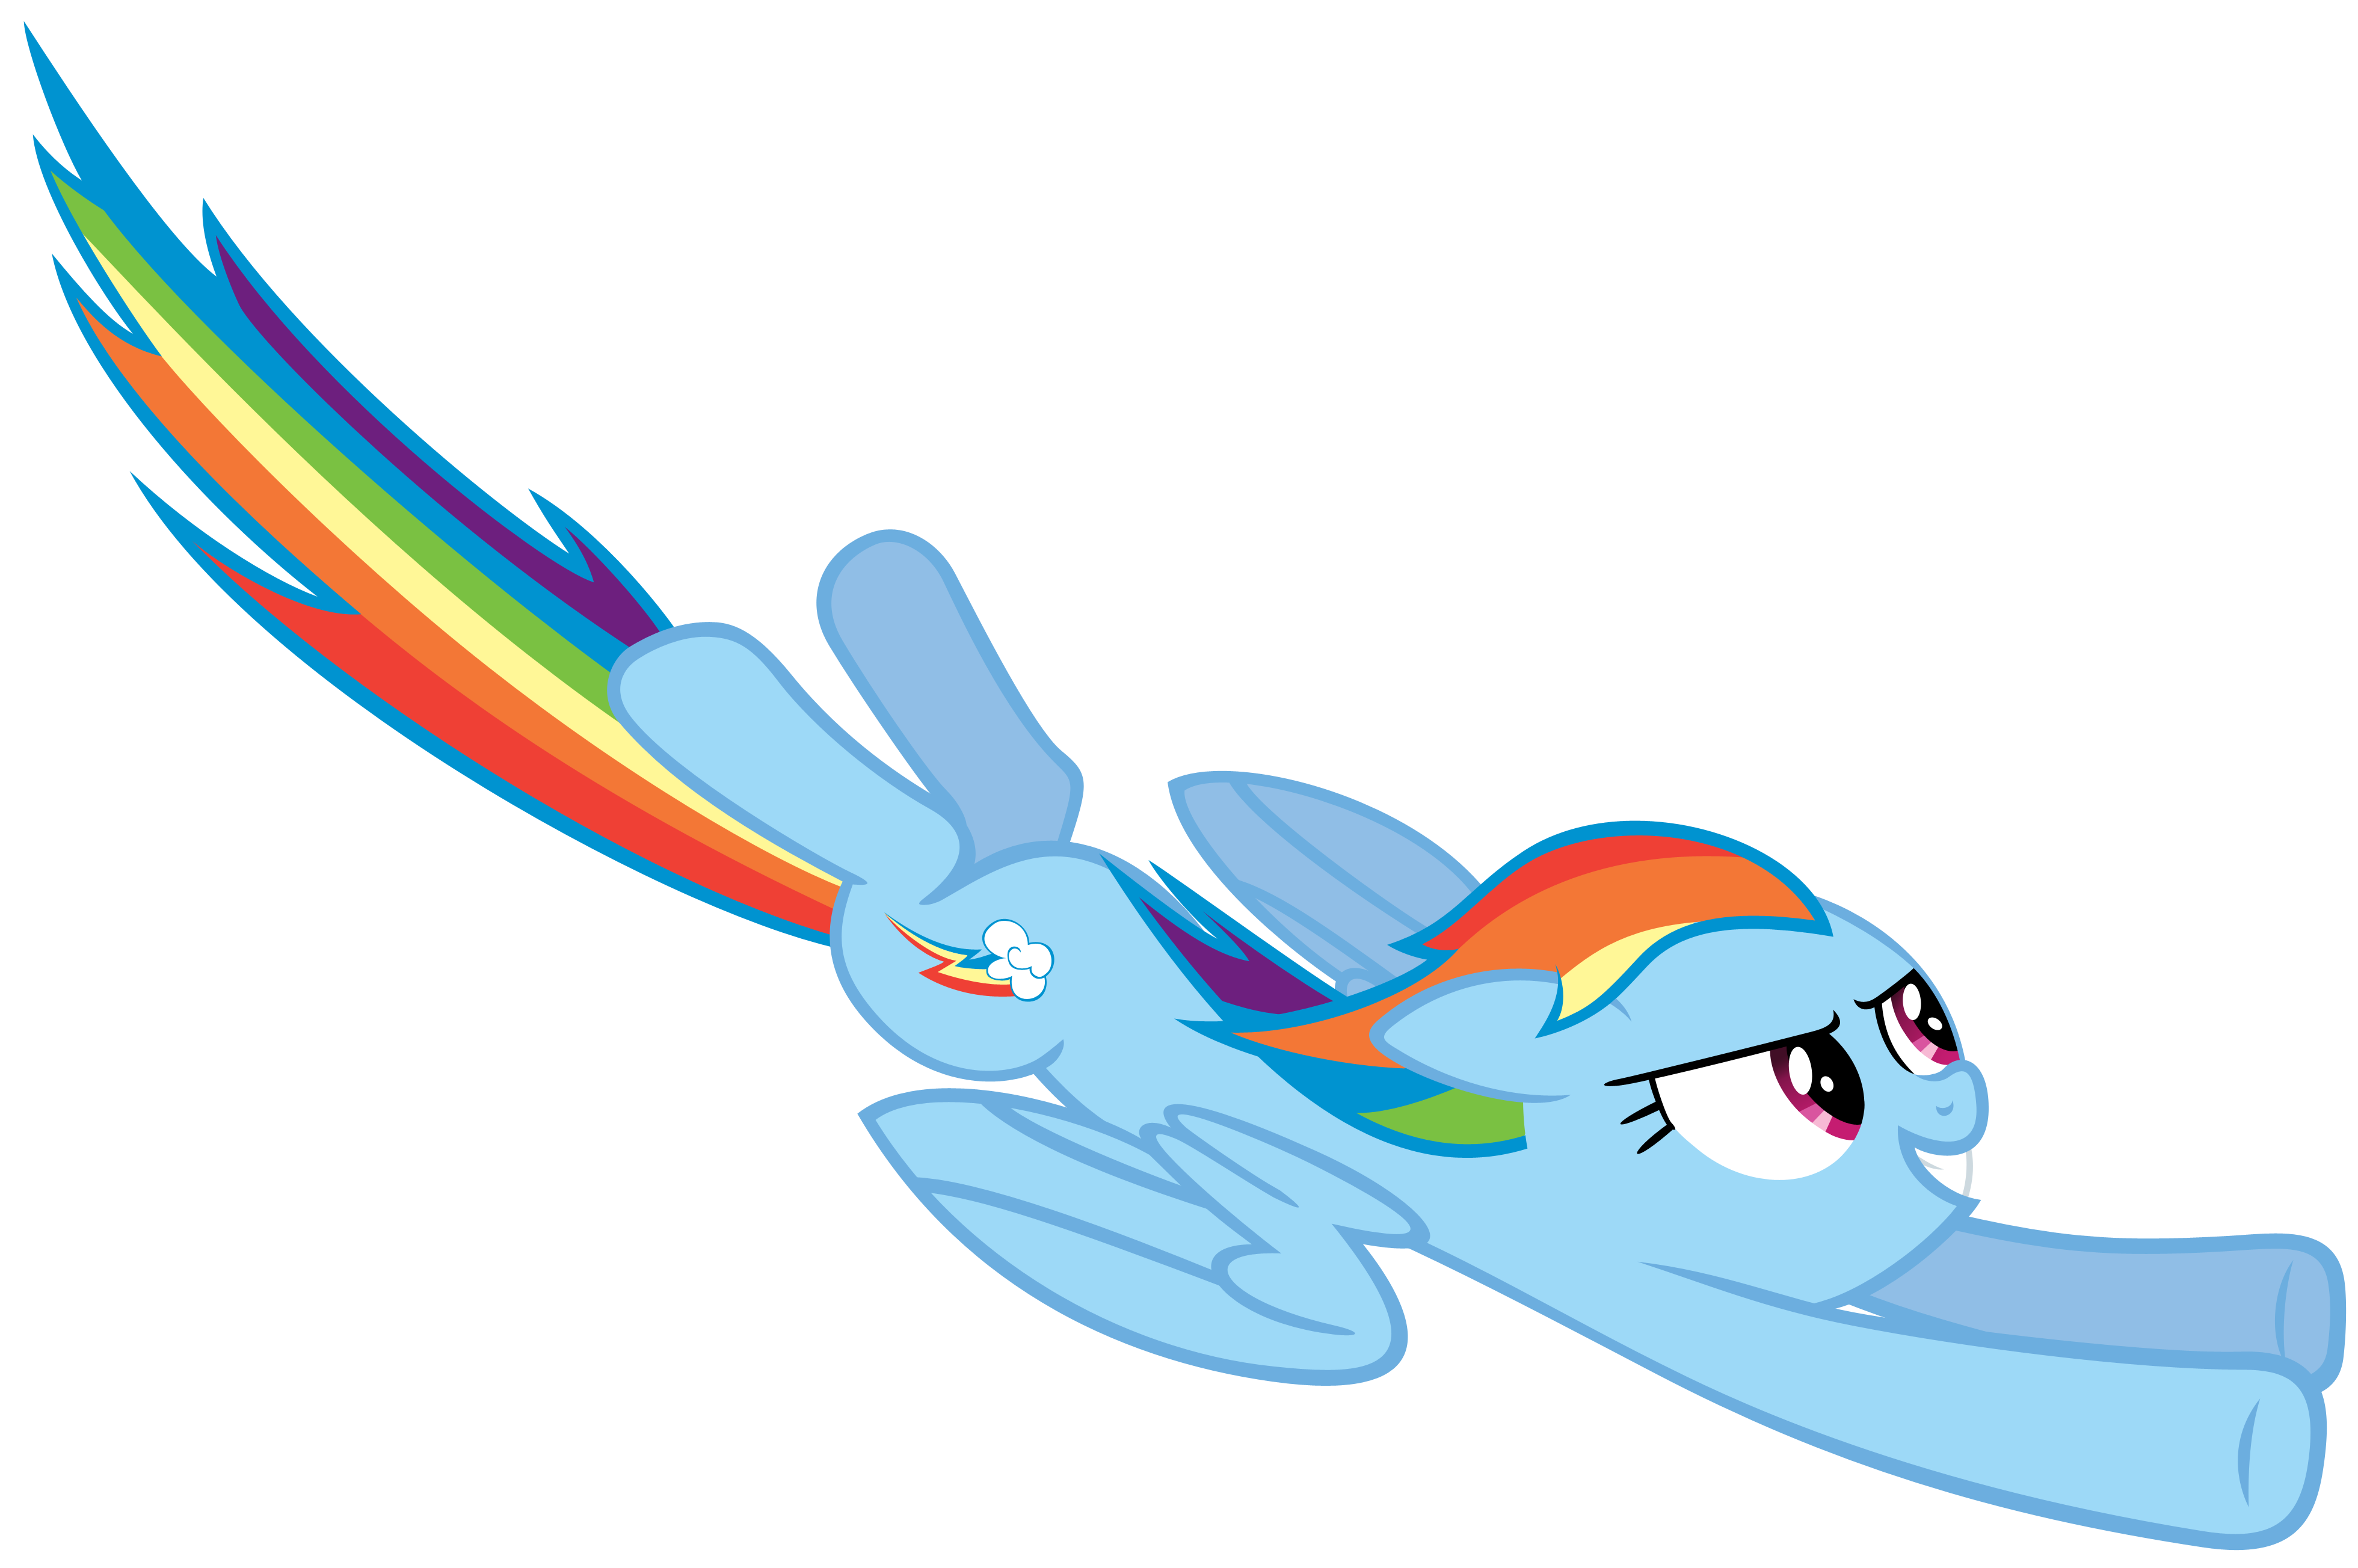 Rainbow Dash flying by Stabzor